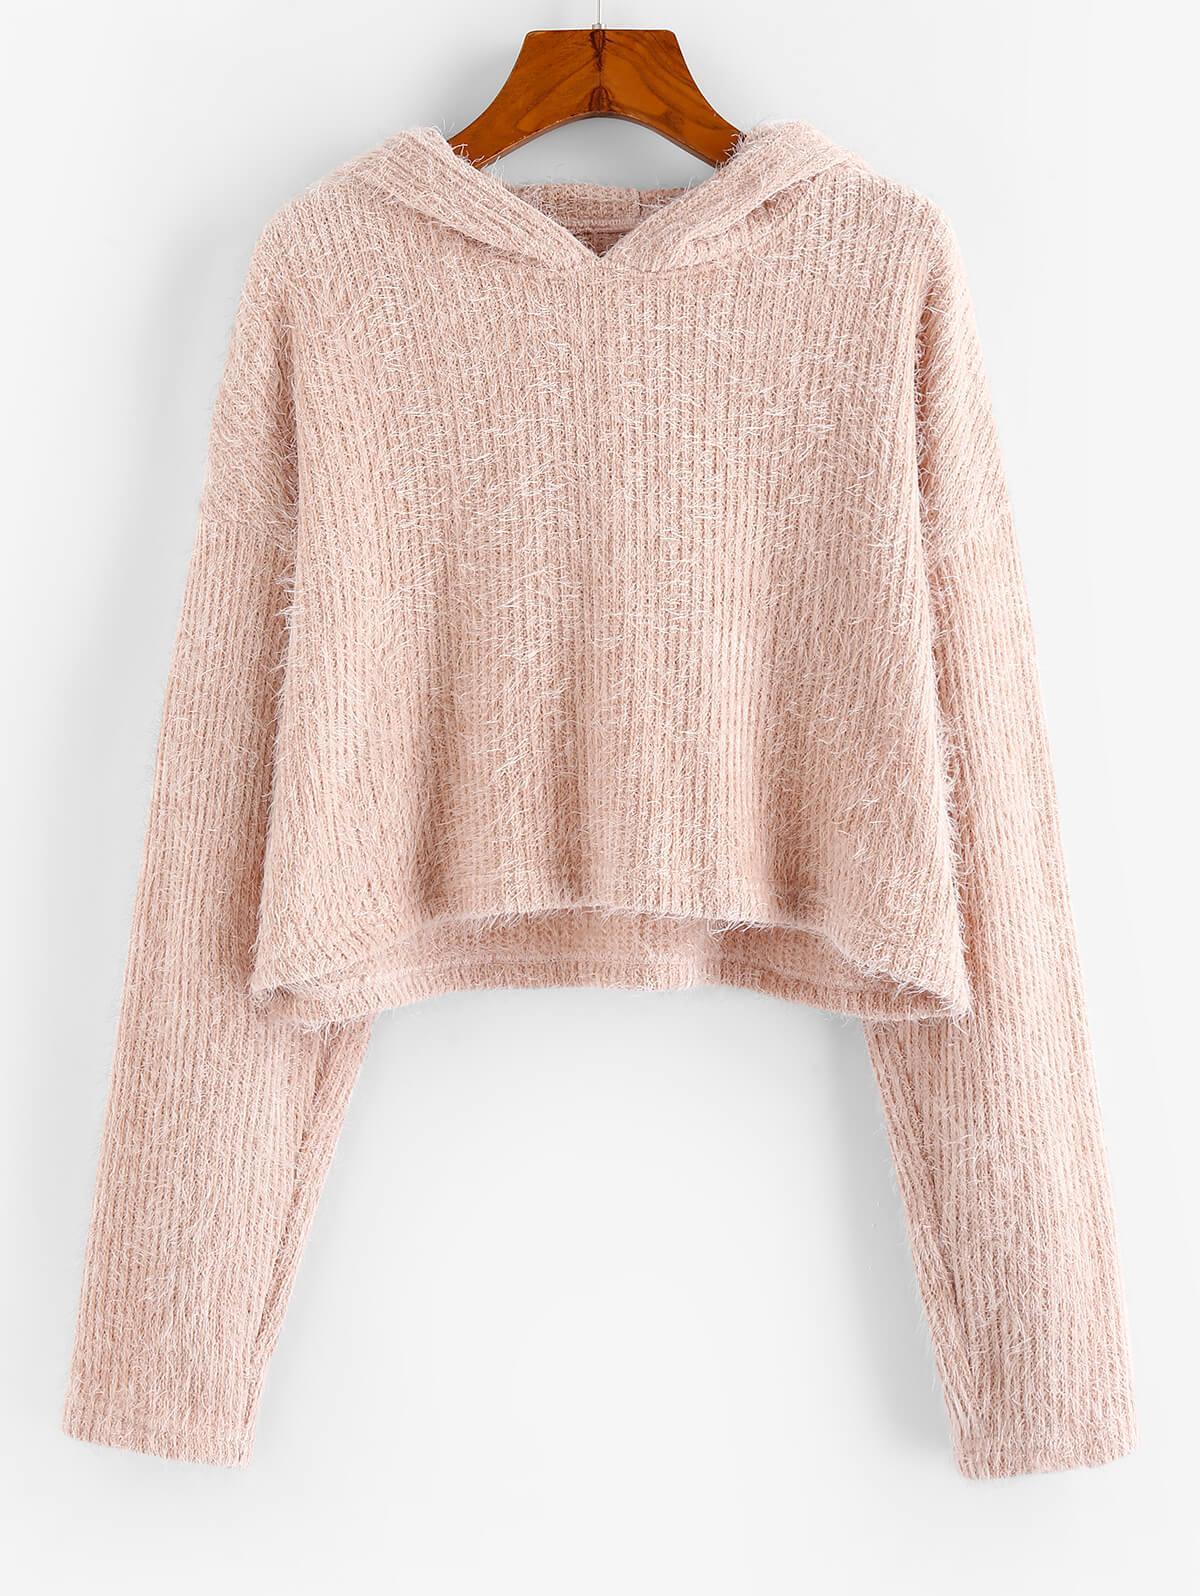 ZAFUL Fluffy Hooded Cropped Sweater